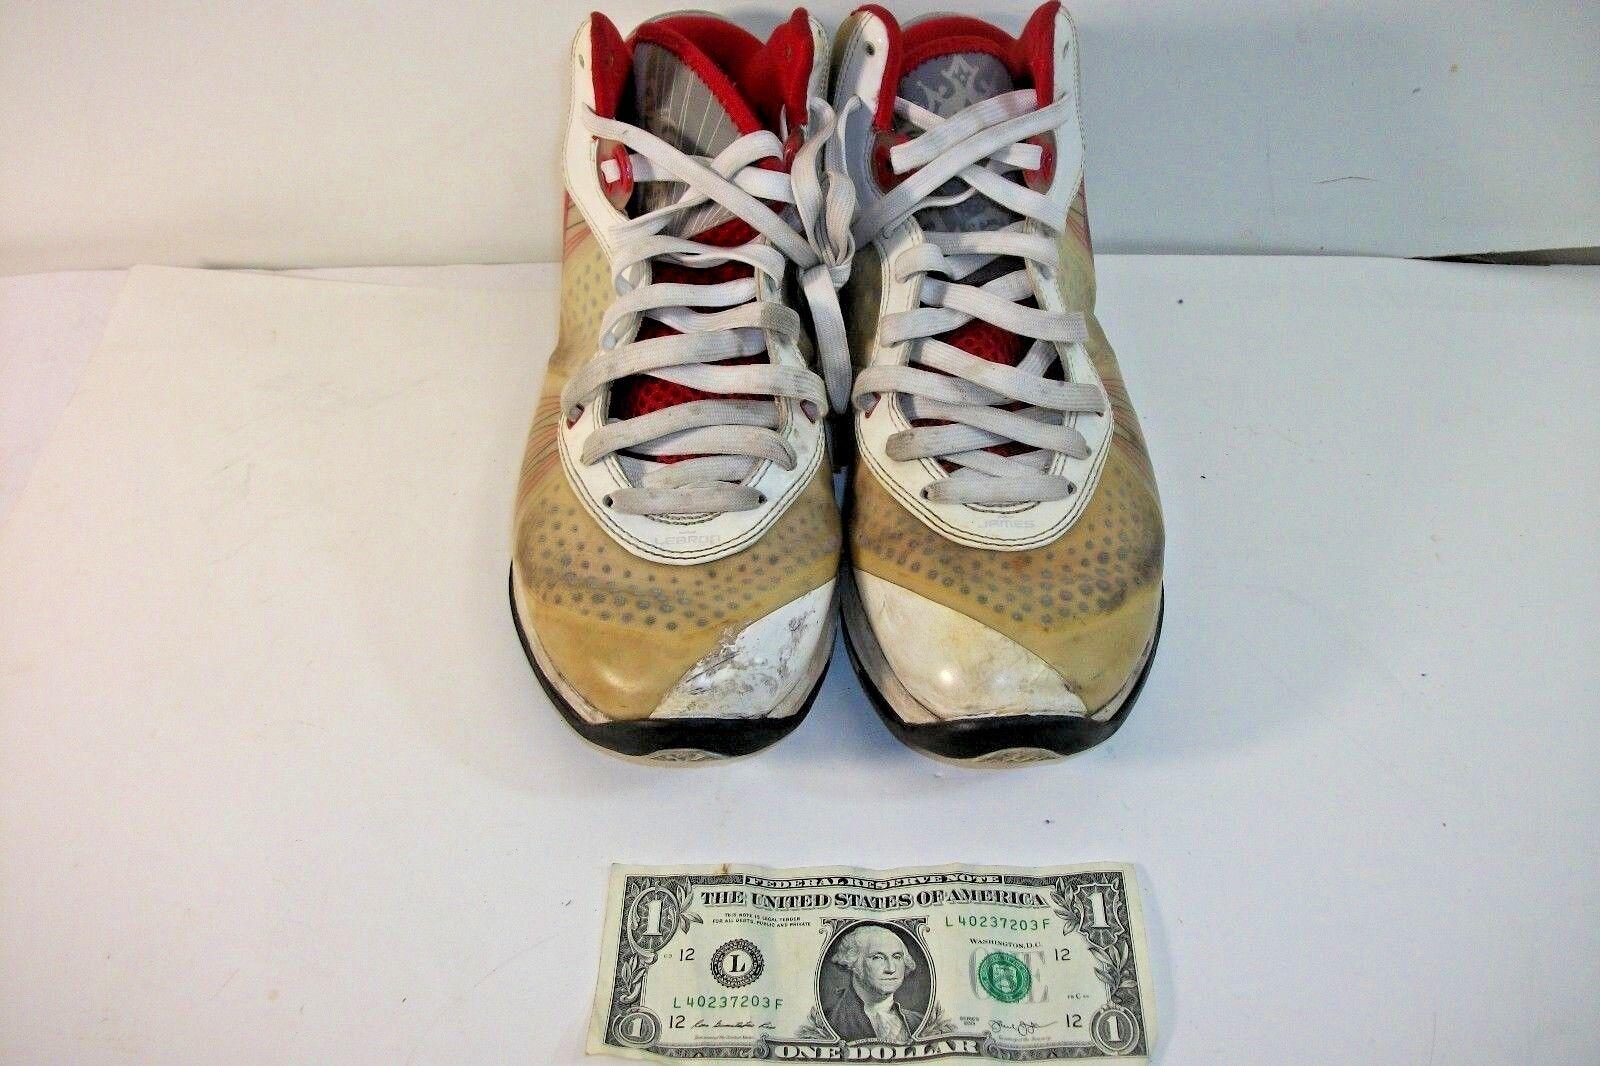 Nike scarpe air max lebron james flywire tan red Uomo scarpe Nike da basket scarpe 9,5 7a5da2